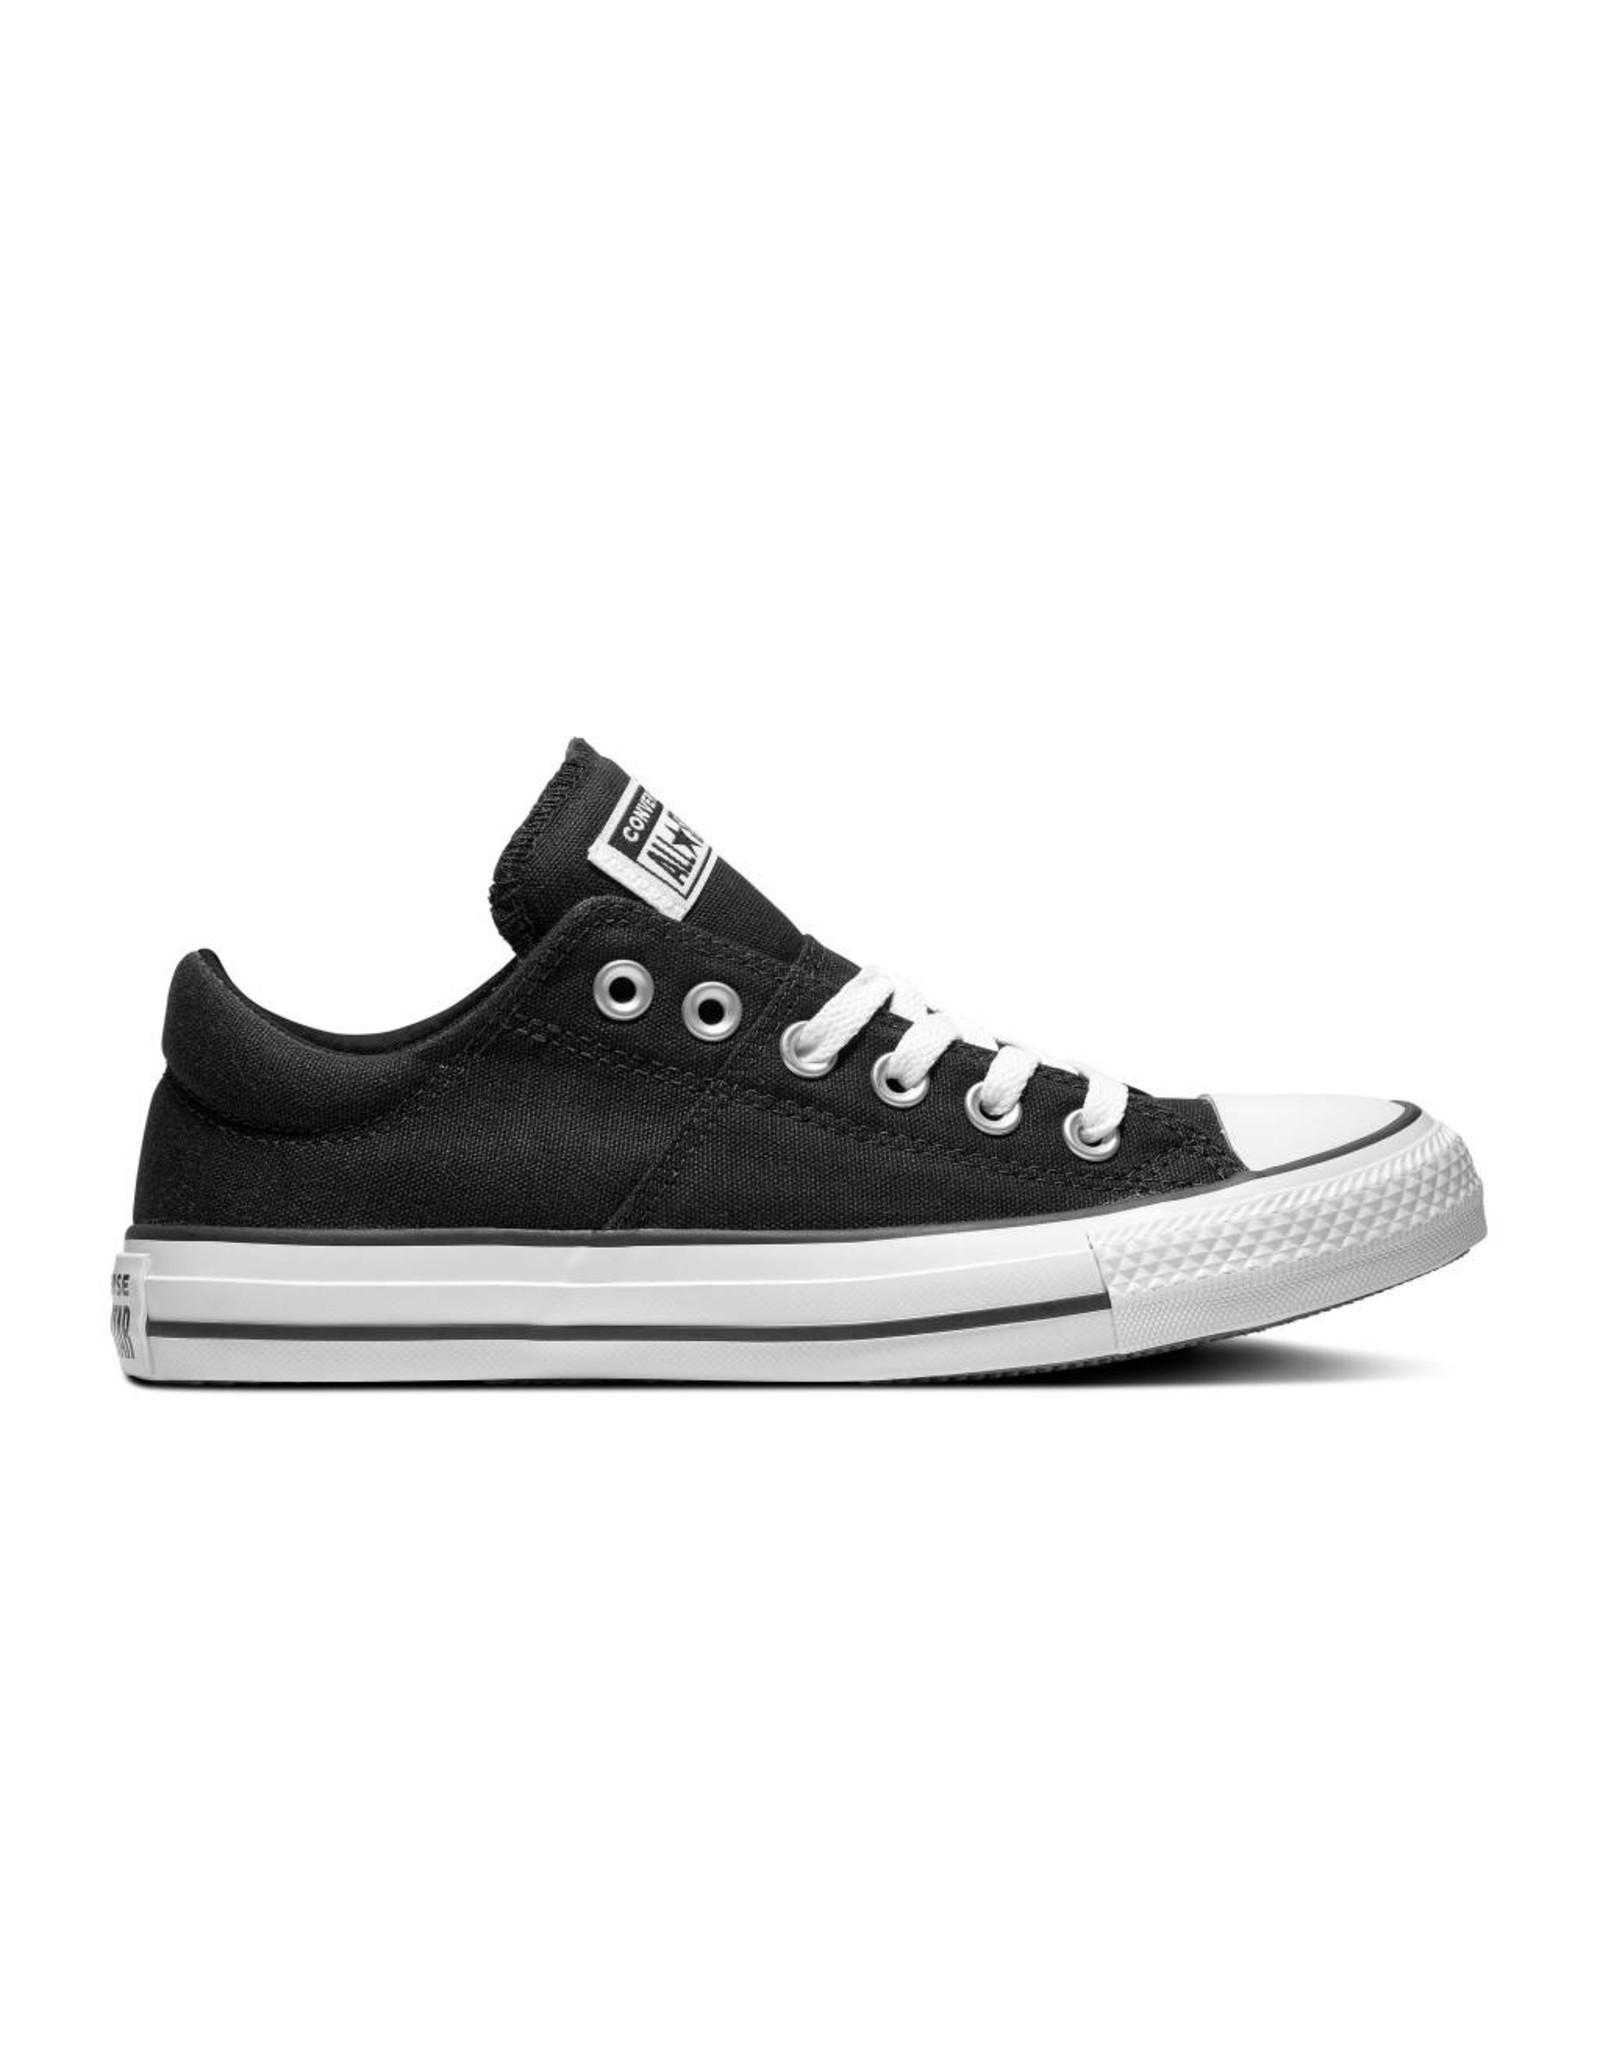 CONVERSE CHUCK TAYLOR ALL STAR MADISON OX BLACK/WHITE/BLACK C13MBL-563508C